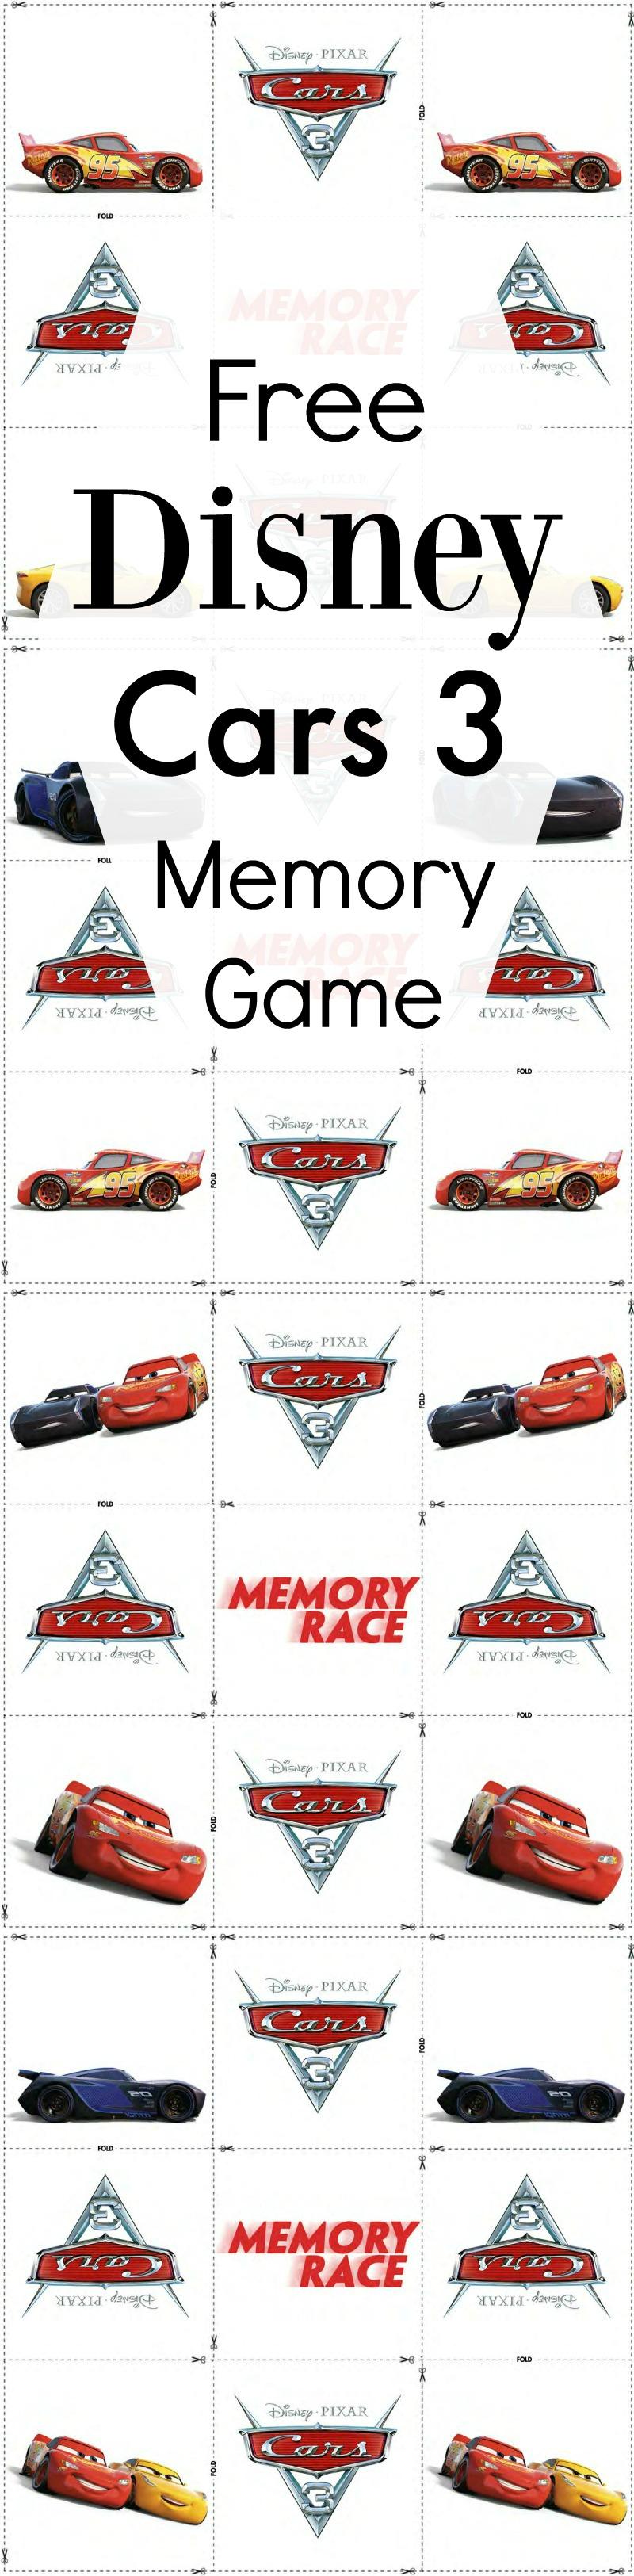 Free Disney Cars 3 Memory Match Game